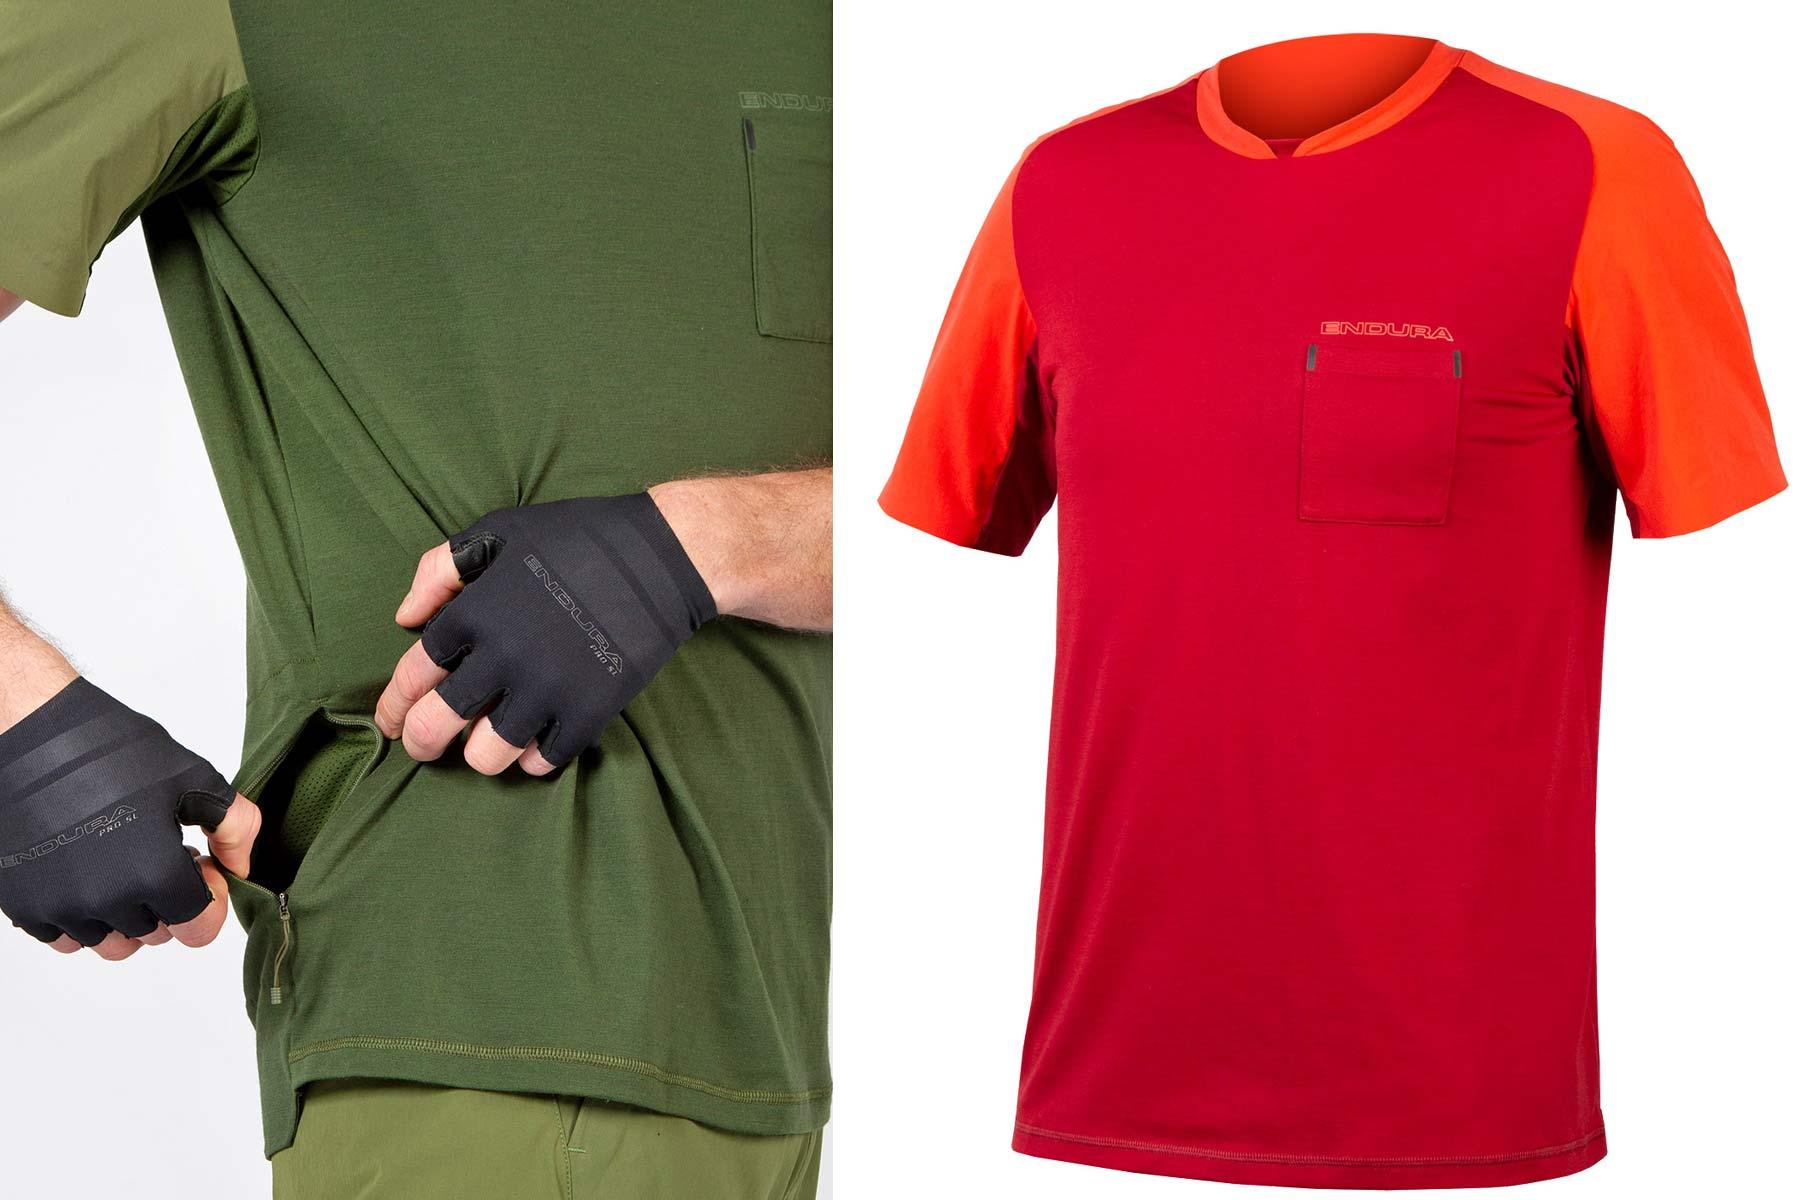 Endura GV500 Gravel Collection clothing, Dirty Reiver & Aberfoyle off-road-ready cycling kit,Foyle t-shirt